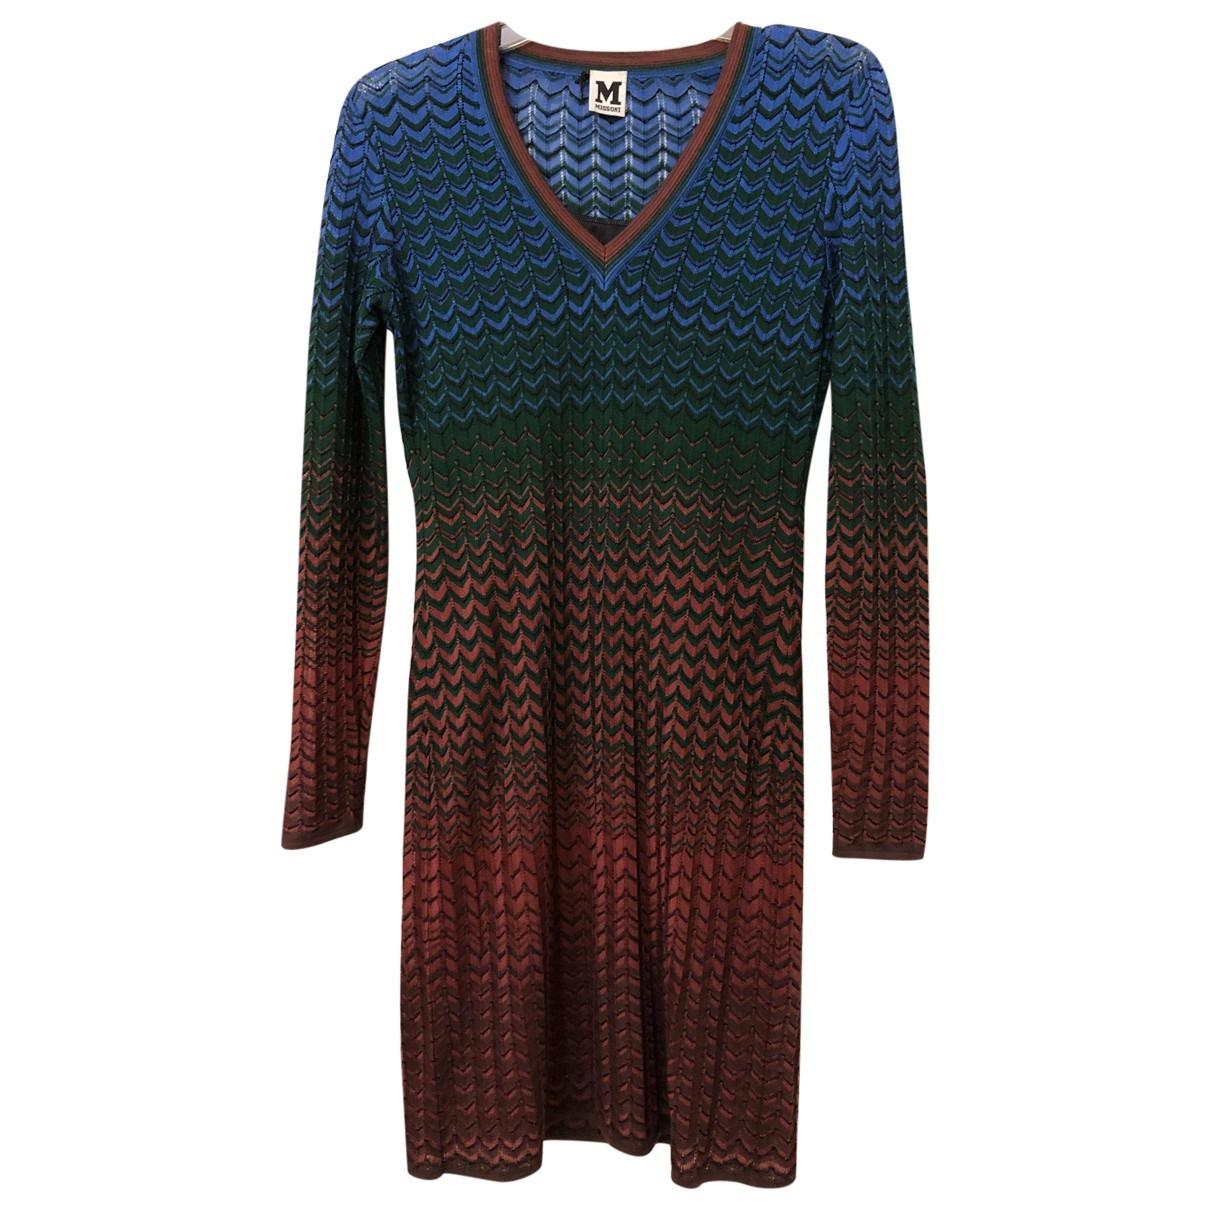 M Missoni \N Multicolour dress for Women 40 IT